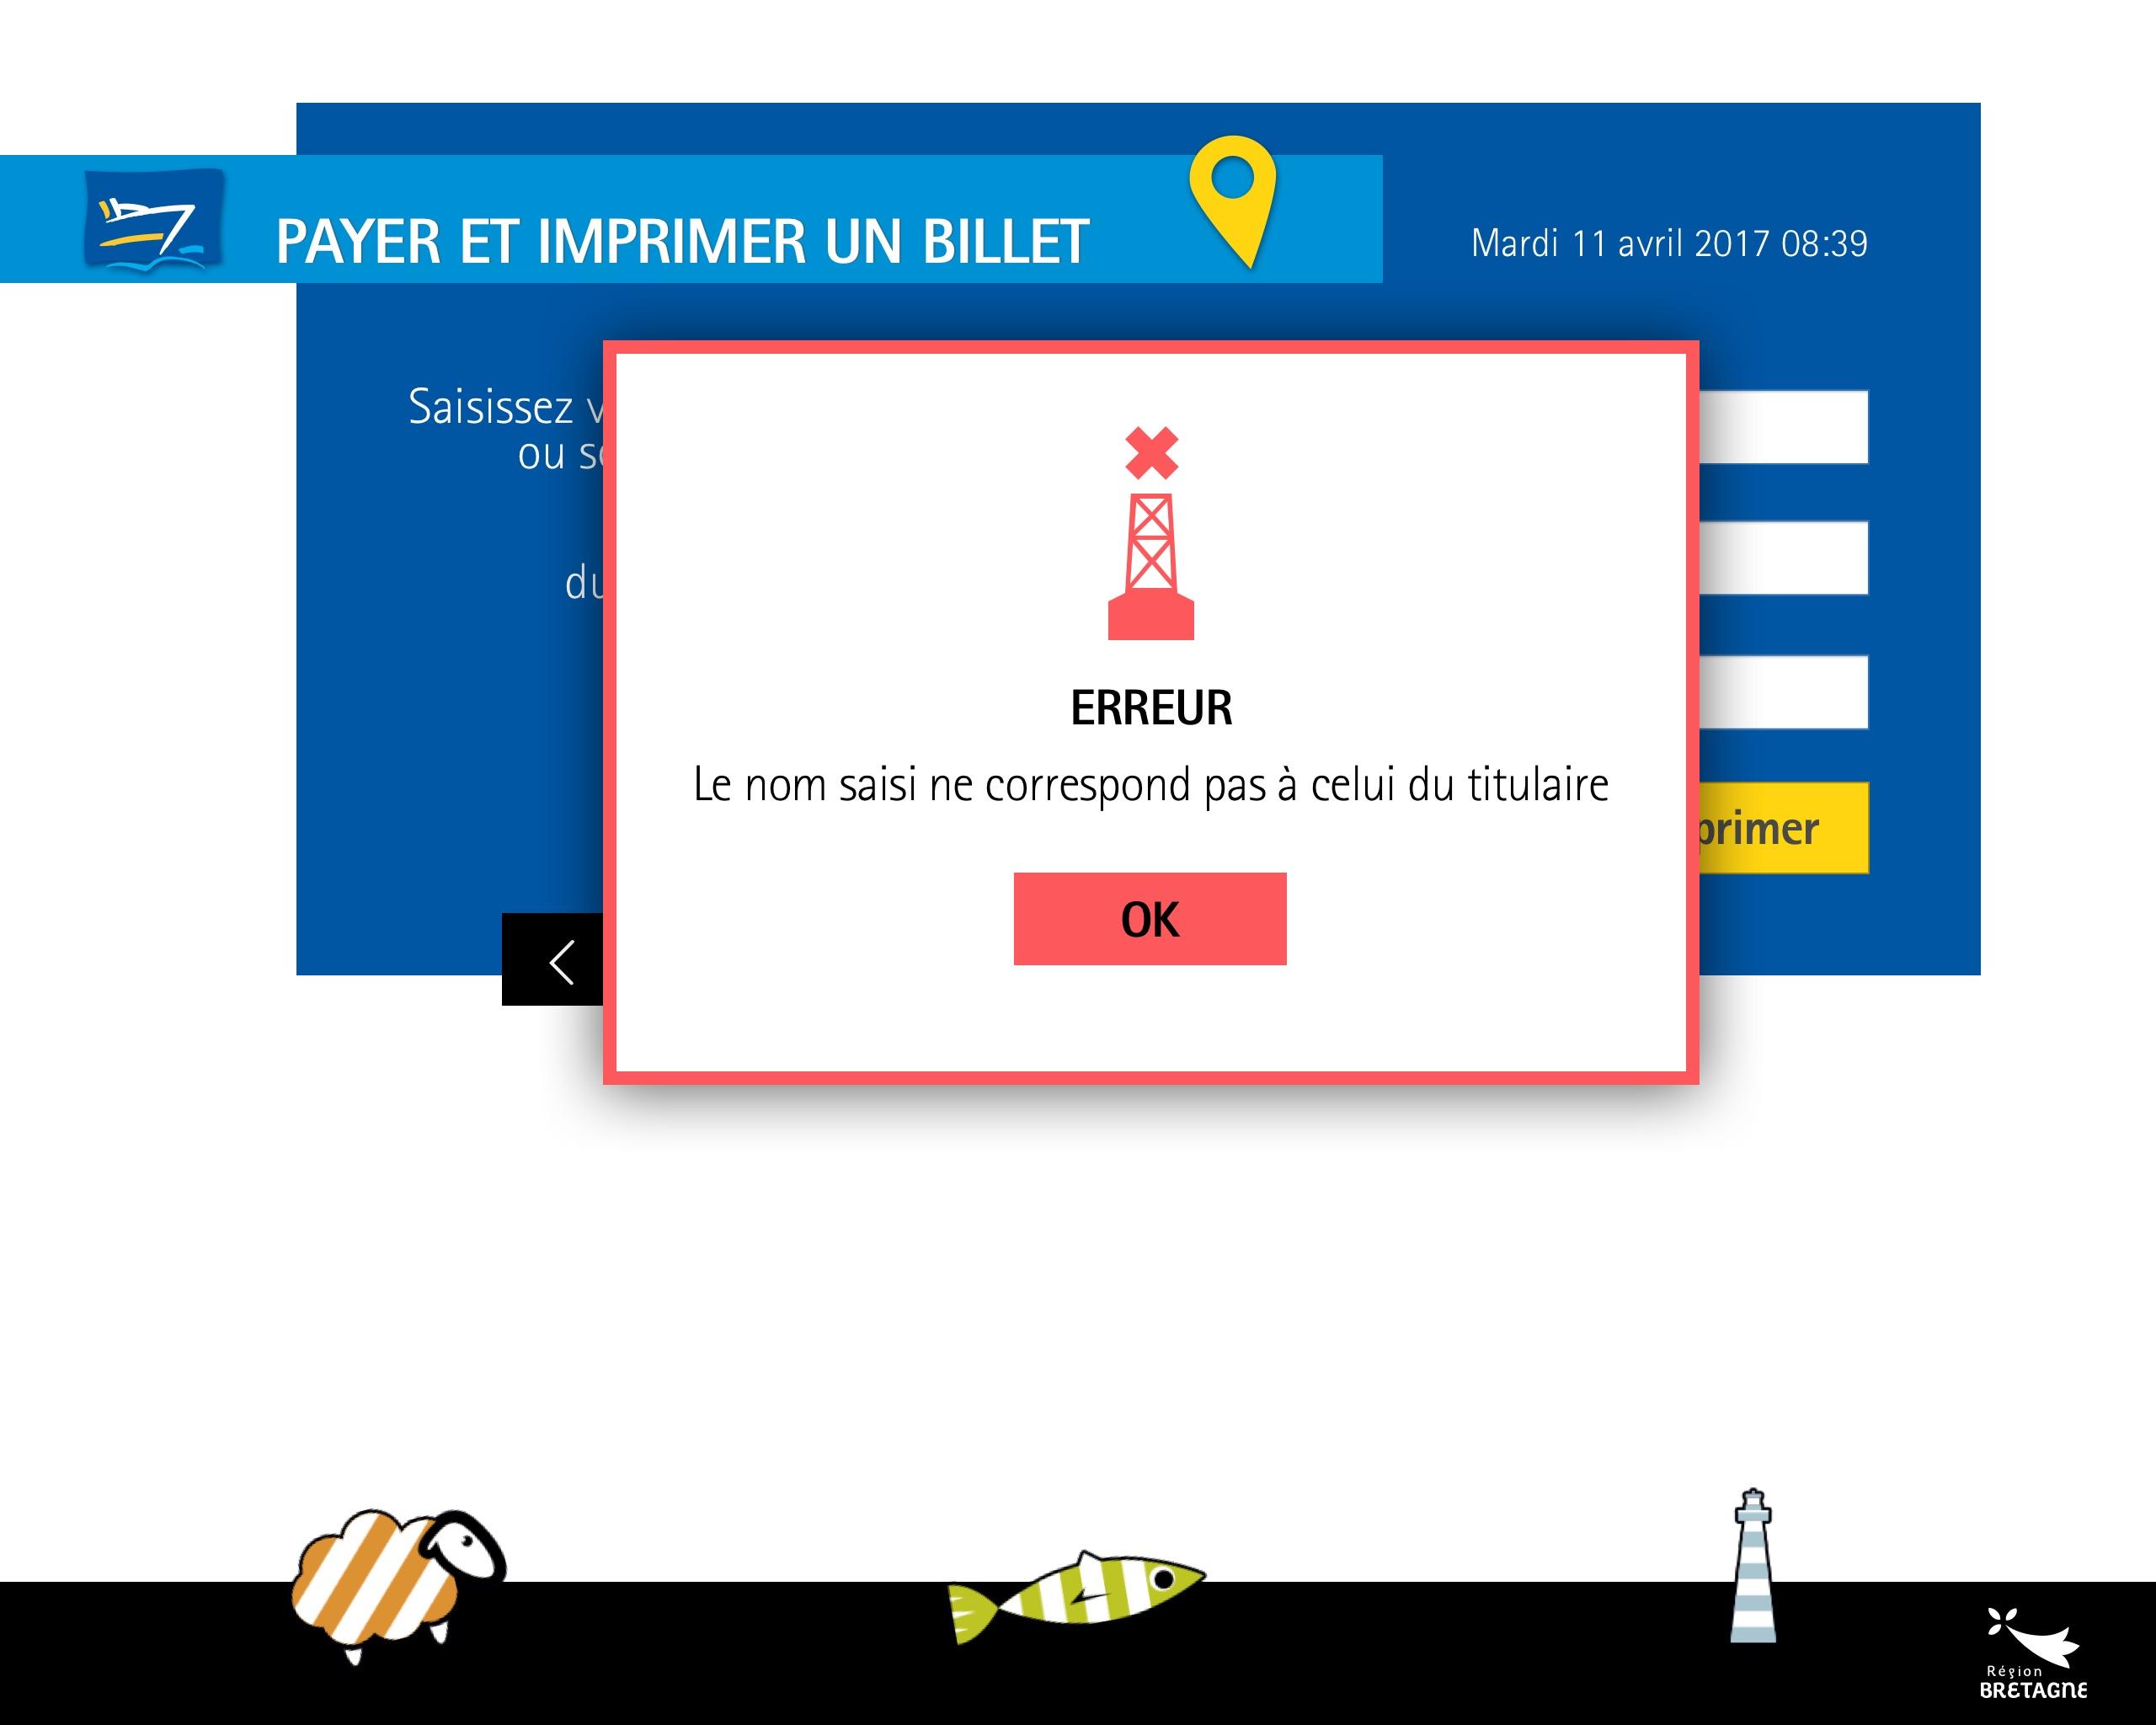 Borne tactile de ventes de billets : écran d'erreur